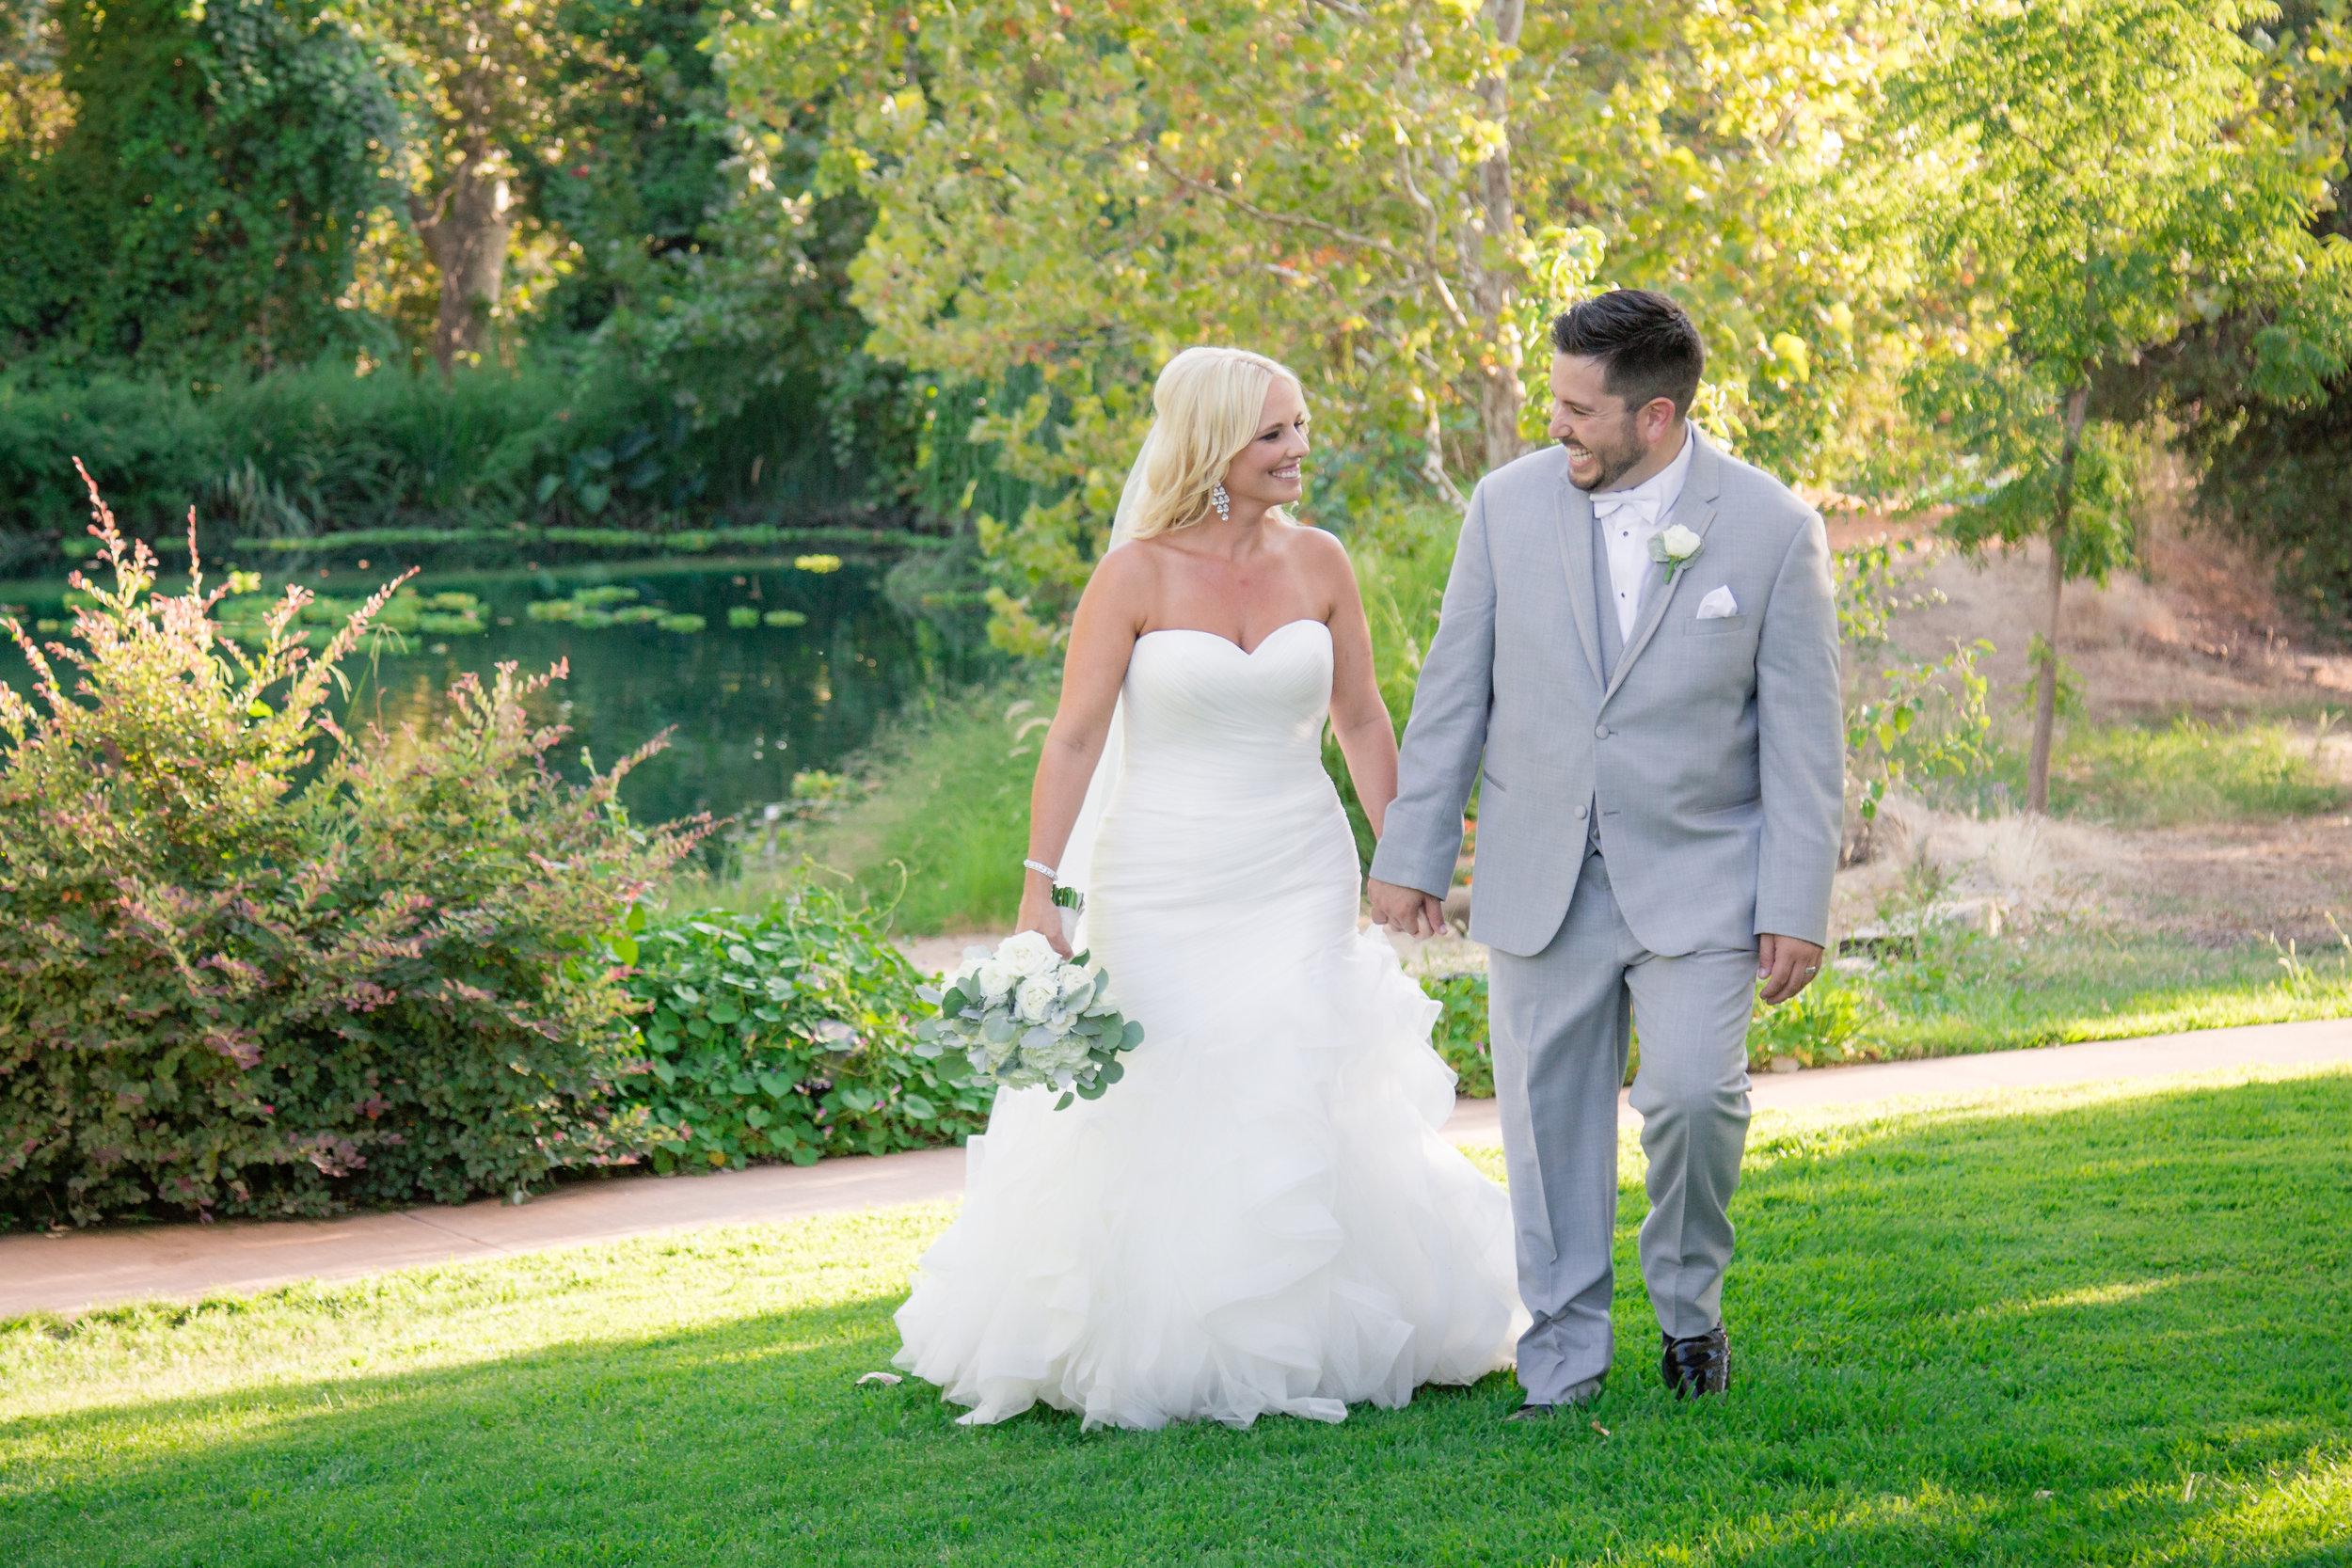 White Ranch Events - Chico - Ashley Teasley Photography - Sacramento Wedding Photographer14.JPG